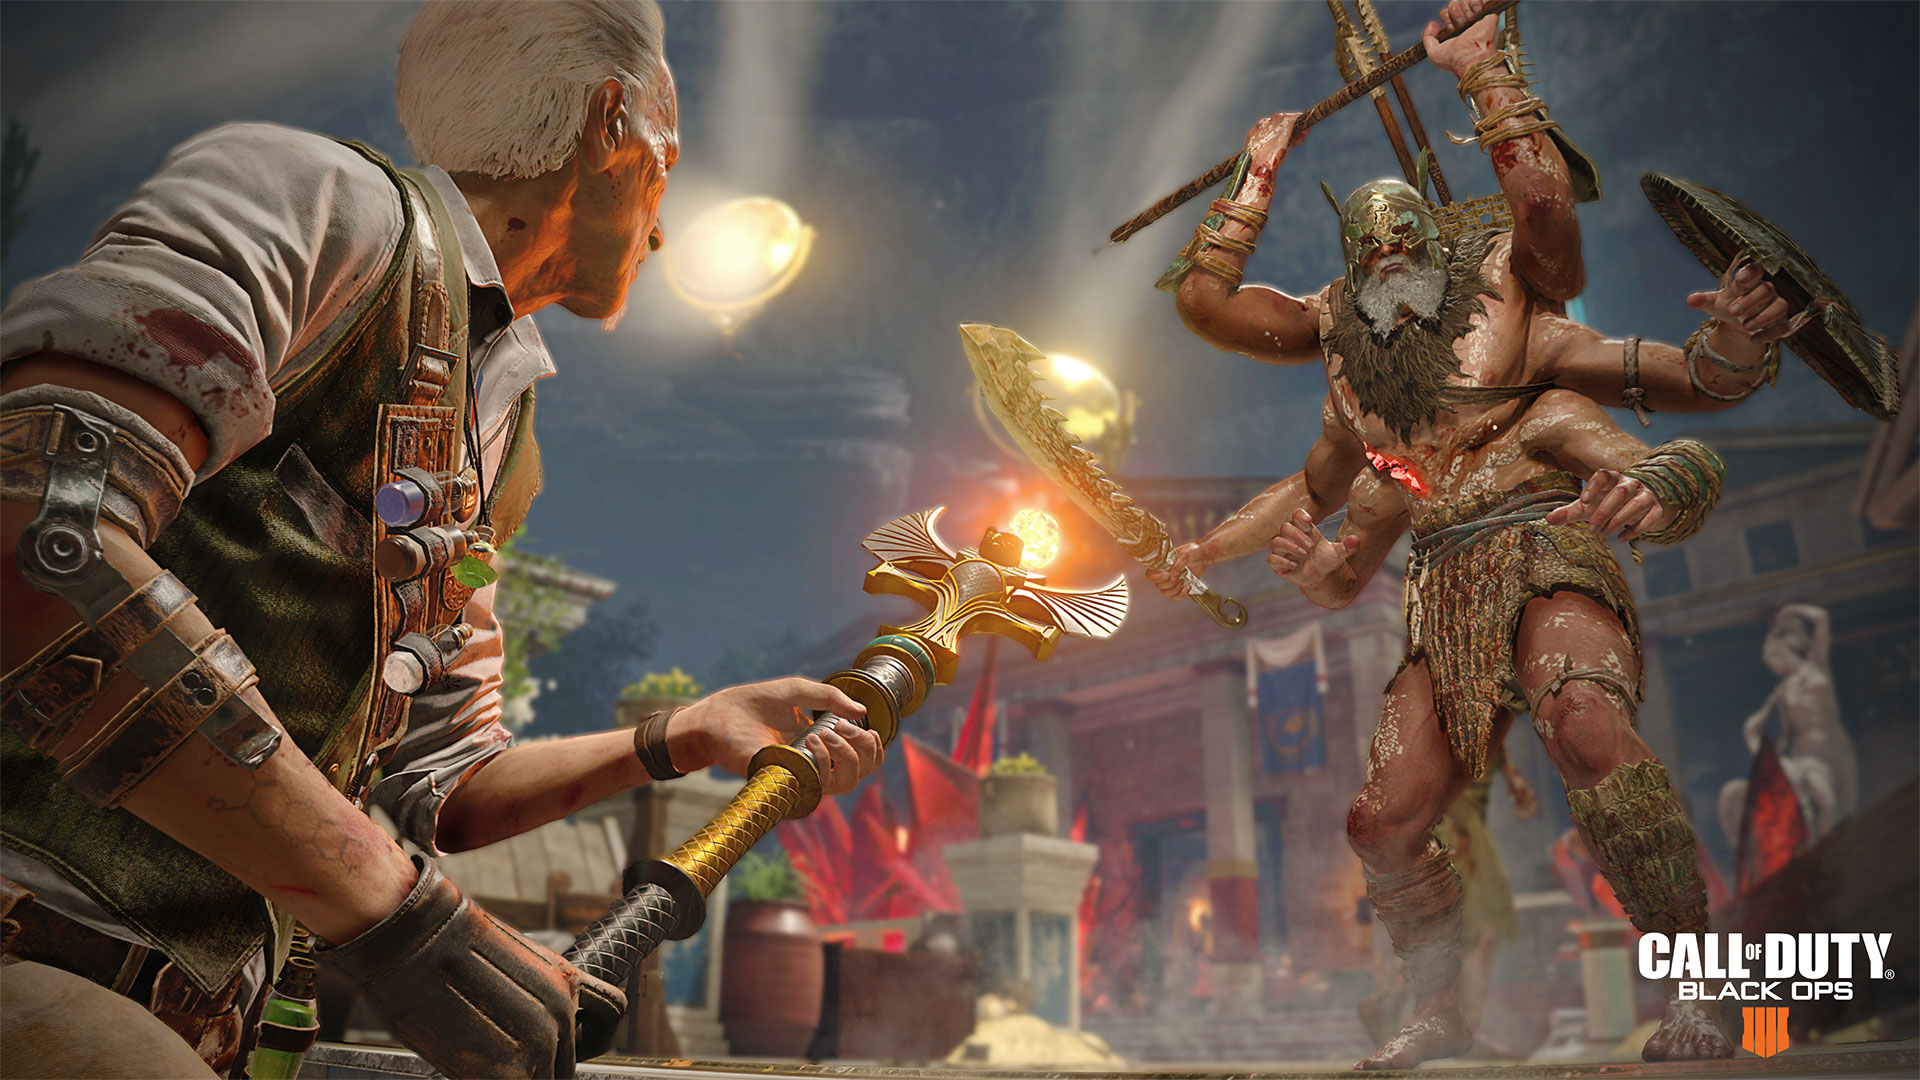 Call Of Duty Black Ops 4 Zombies Spotlight Annihilating Enemies